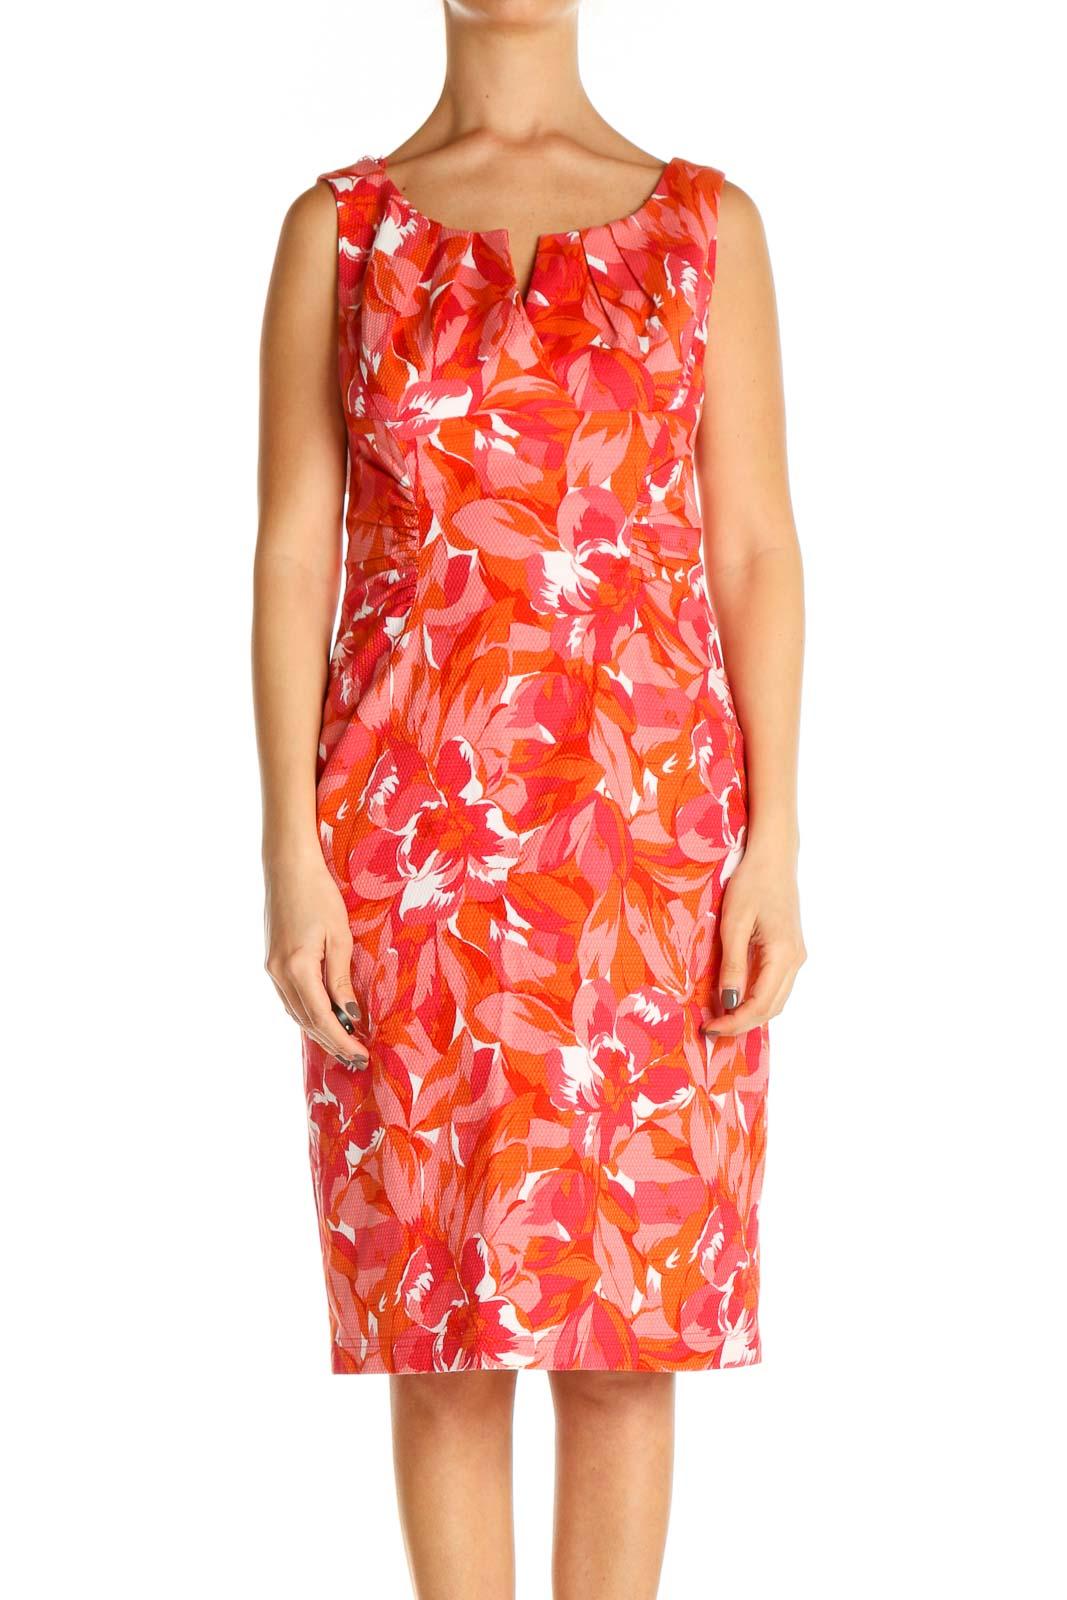 Orange Floral Print Day Sheath Dress Front